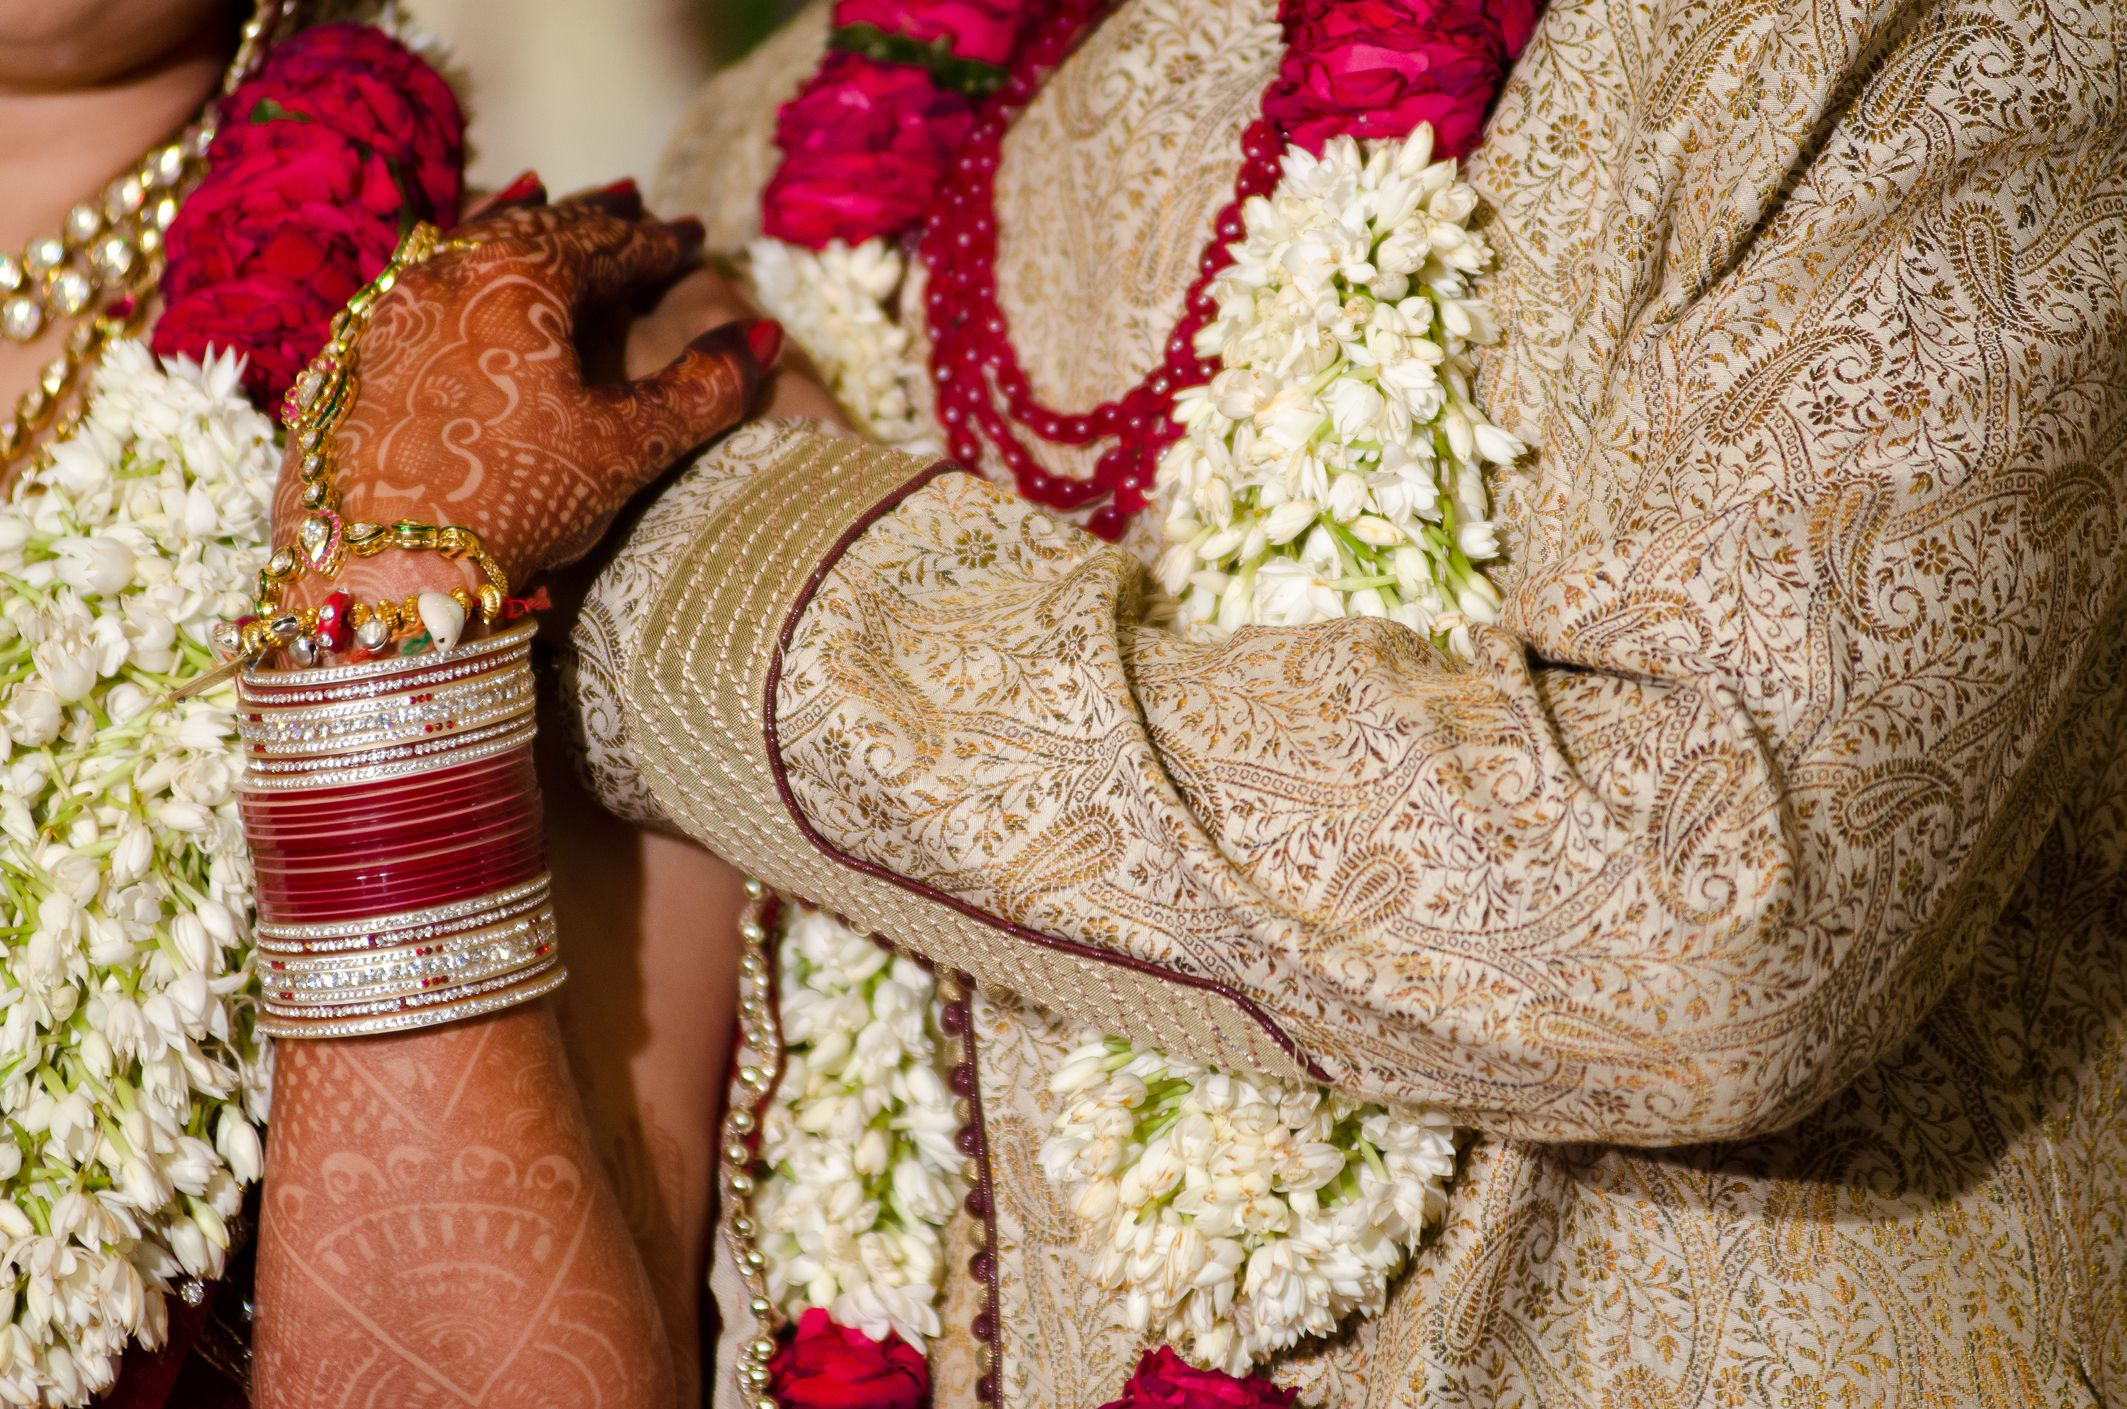 Jasmine garlands on bride and groom for hindu wedding